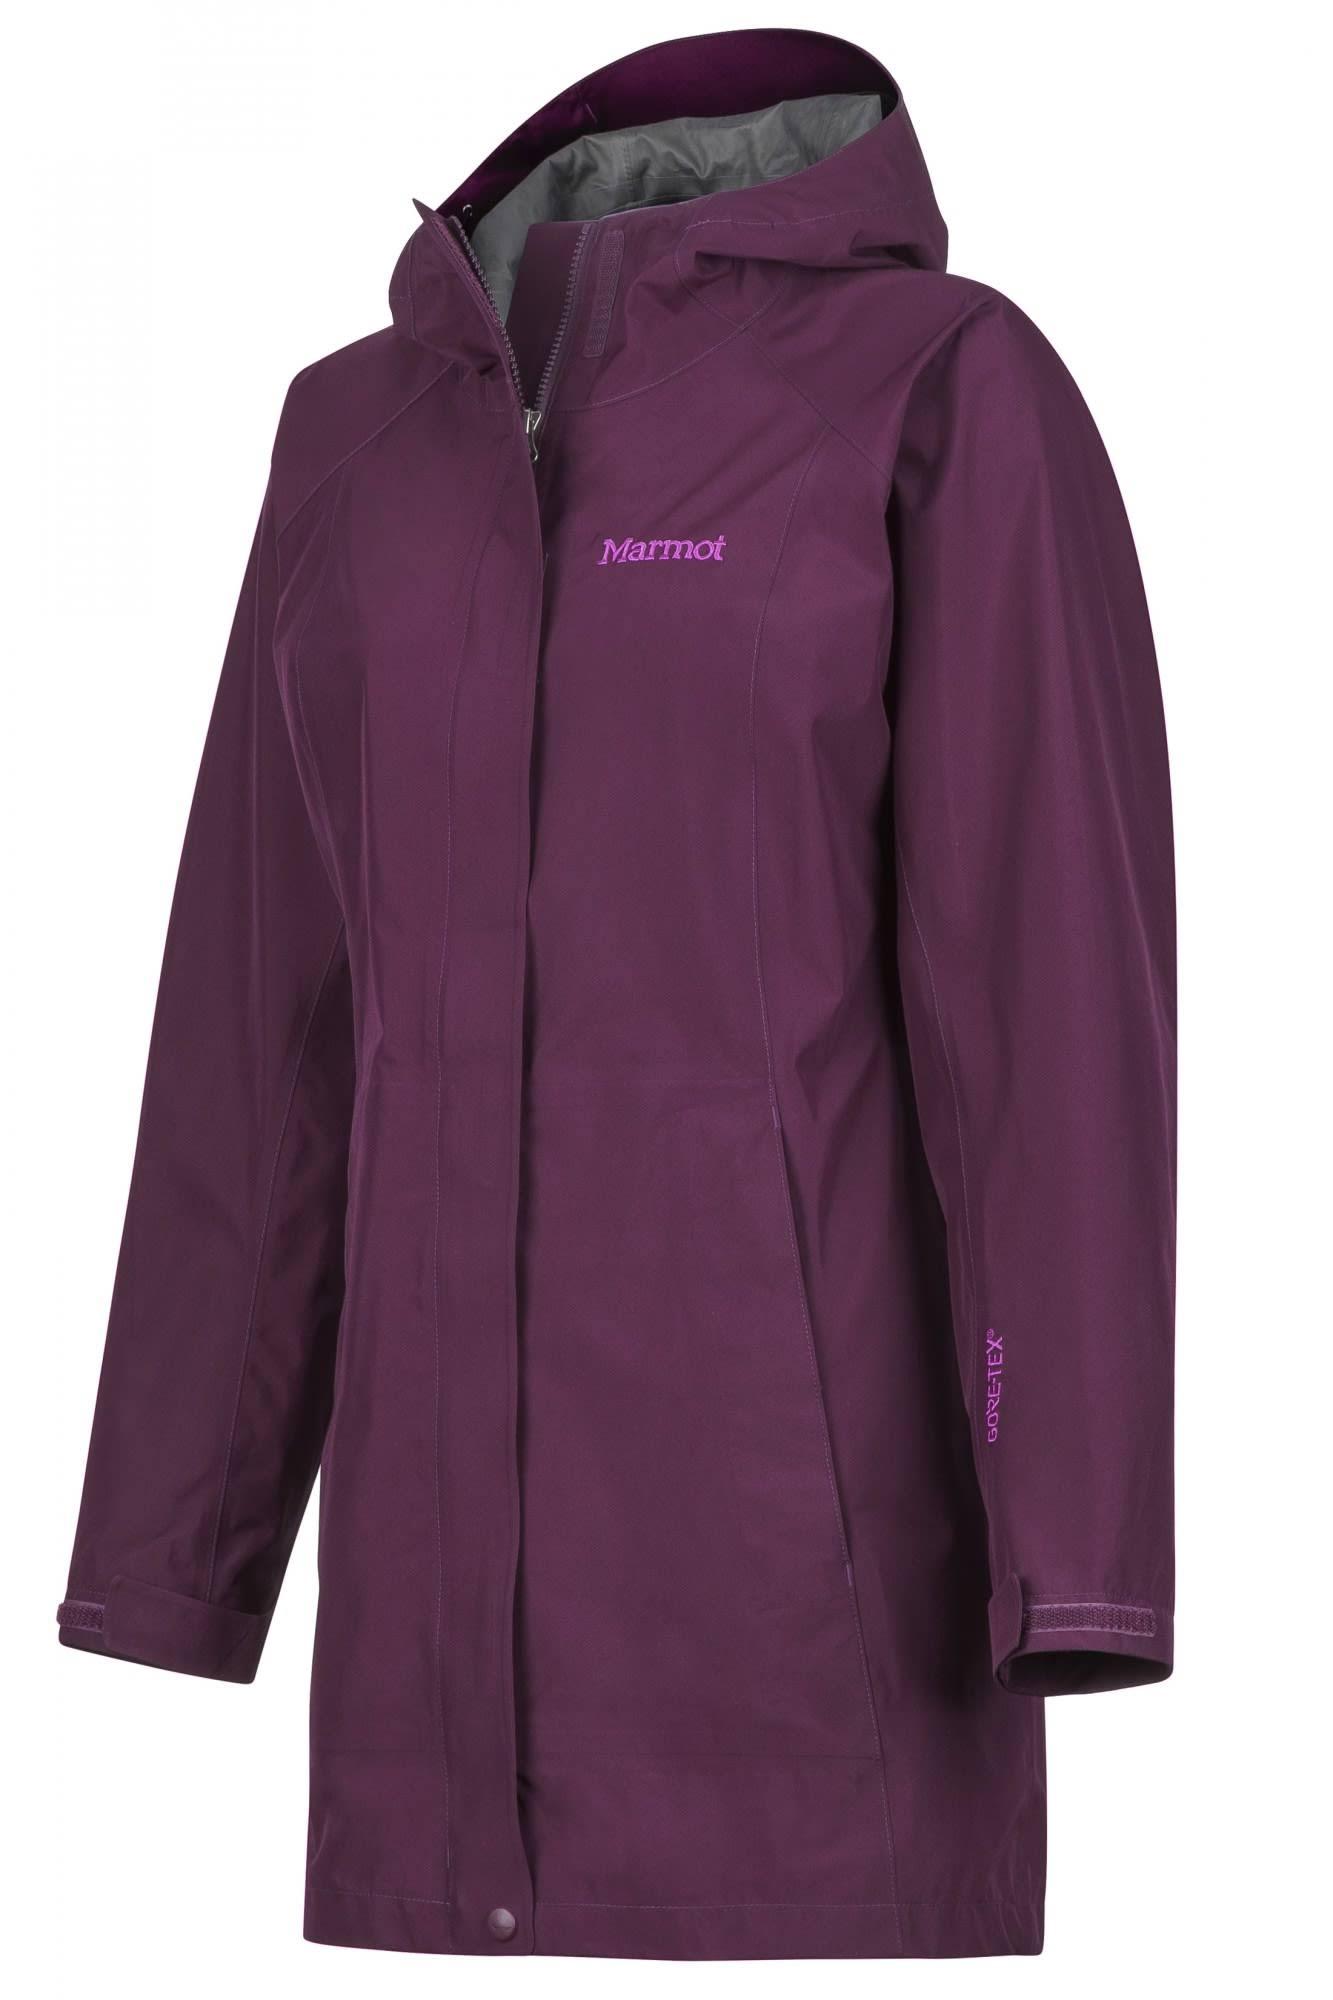 45480 Para Marmot Tamaño tex Grande Oscuro Púrpura Mujer Essential Chaqueta Gore BwUZq4ZY